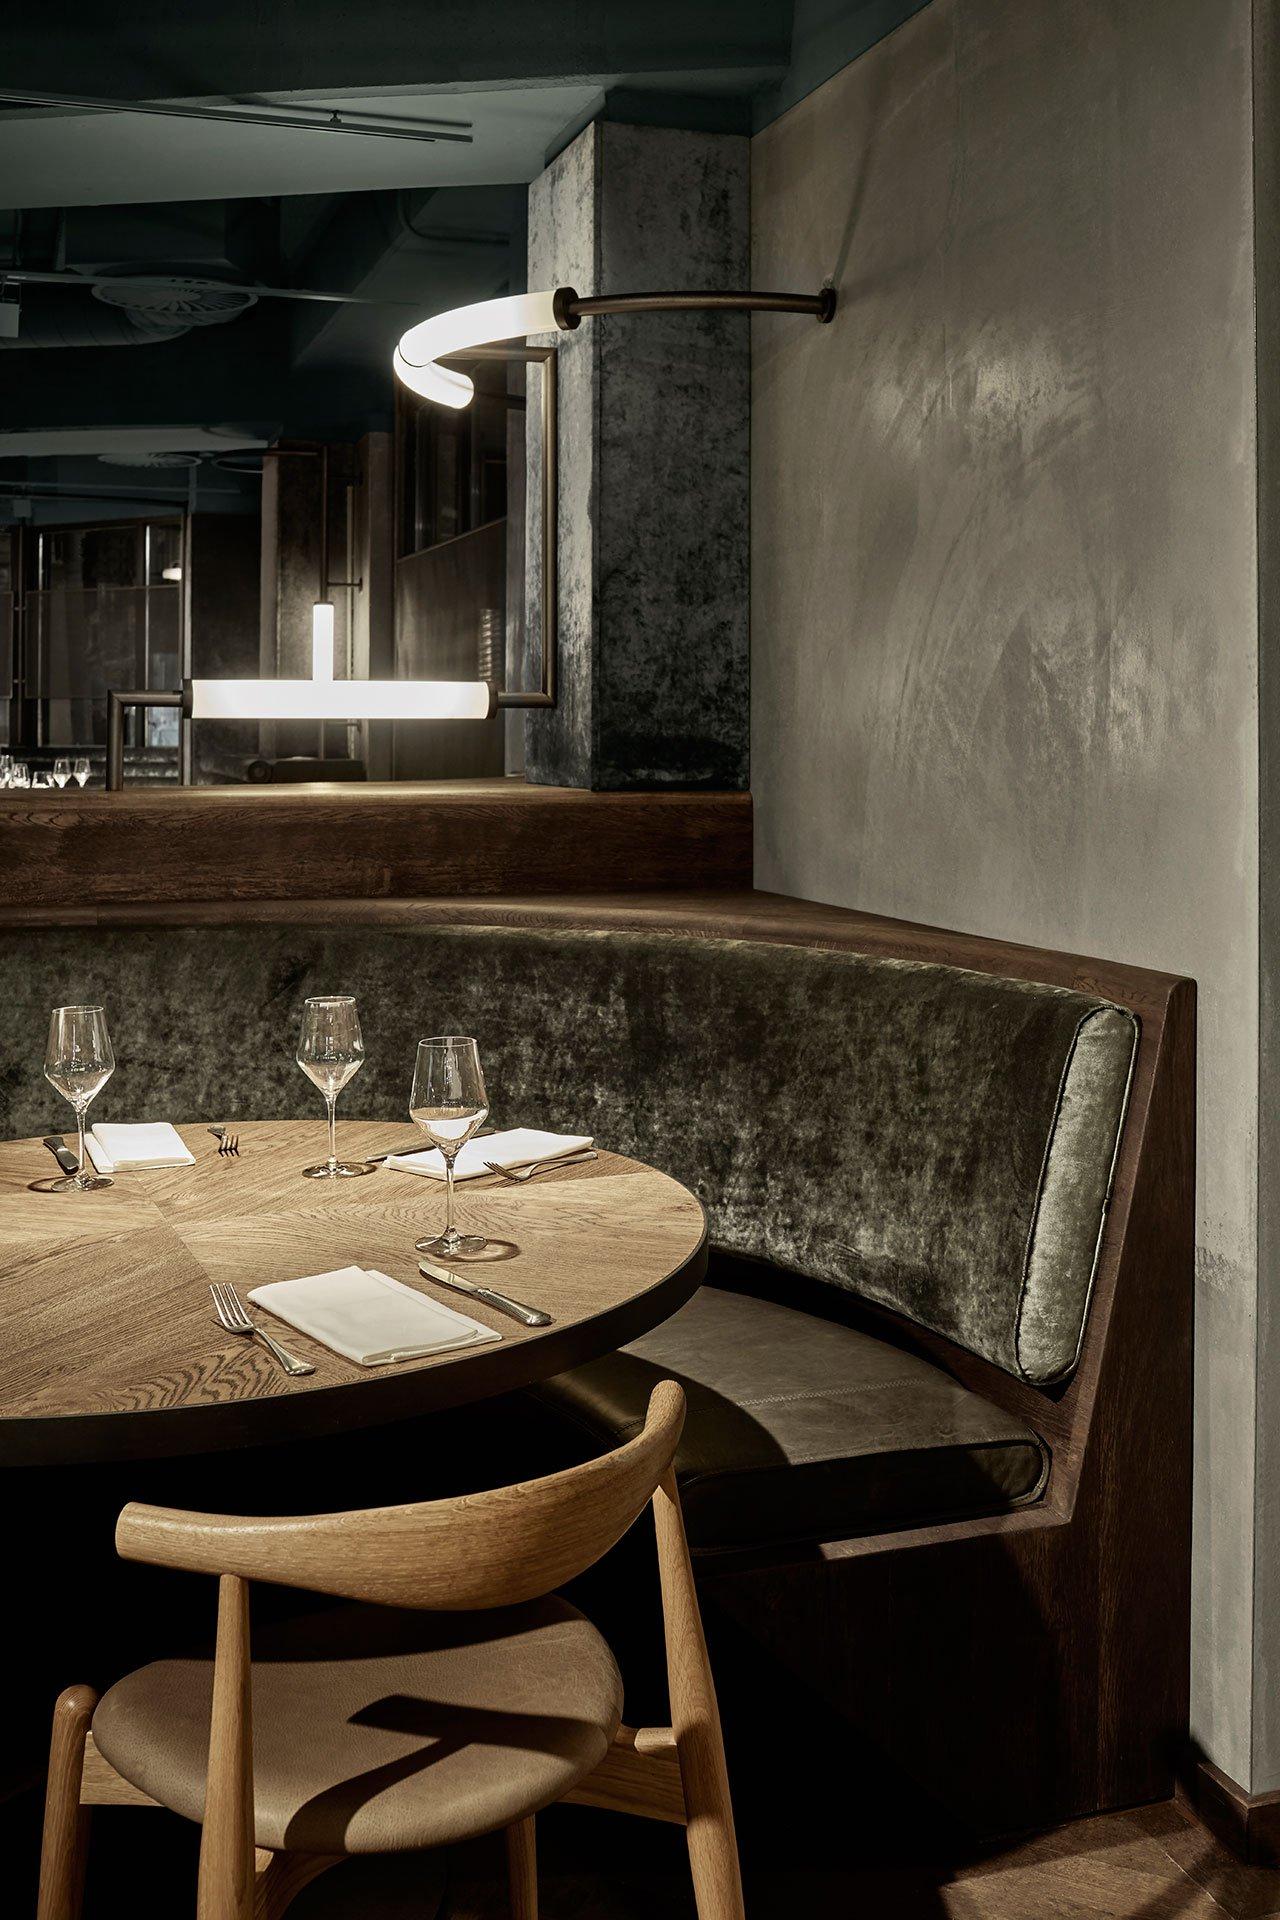 s6_restaurant_wyers_and_miss_louisa_amsterdam_the_netherlands_studio_modijefsky_yatzer.jpg